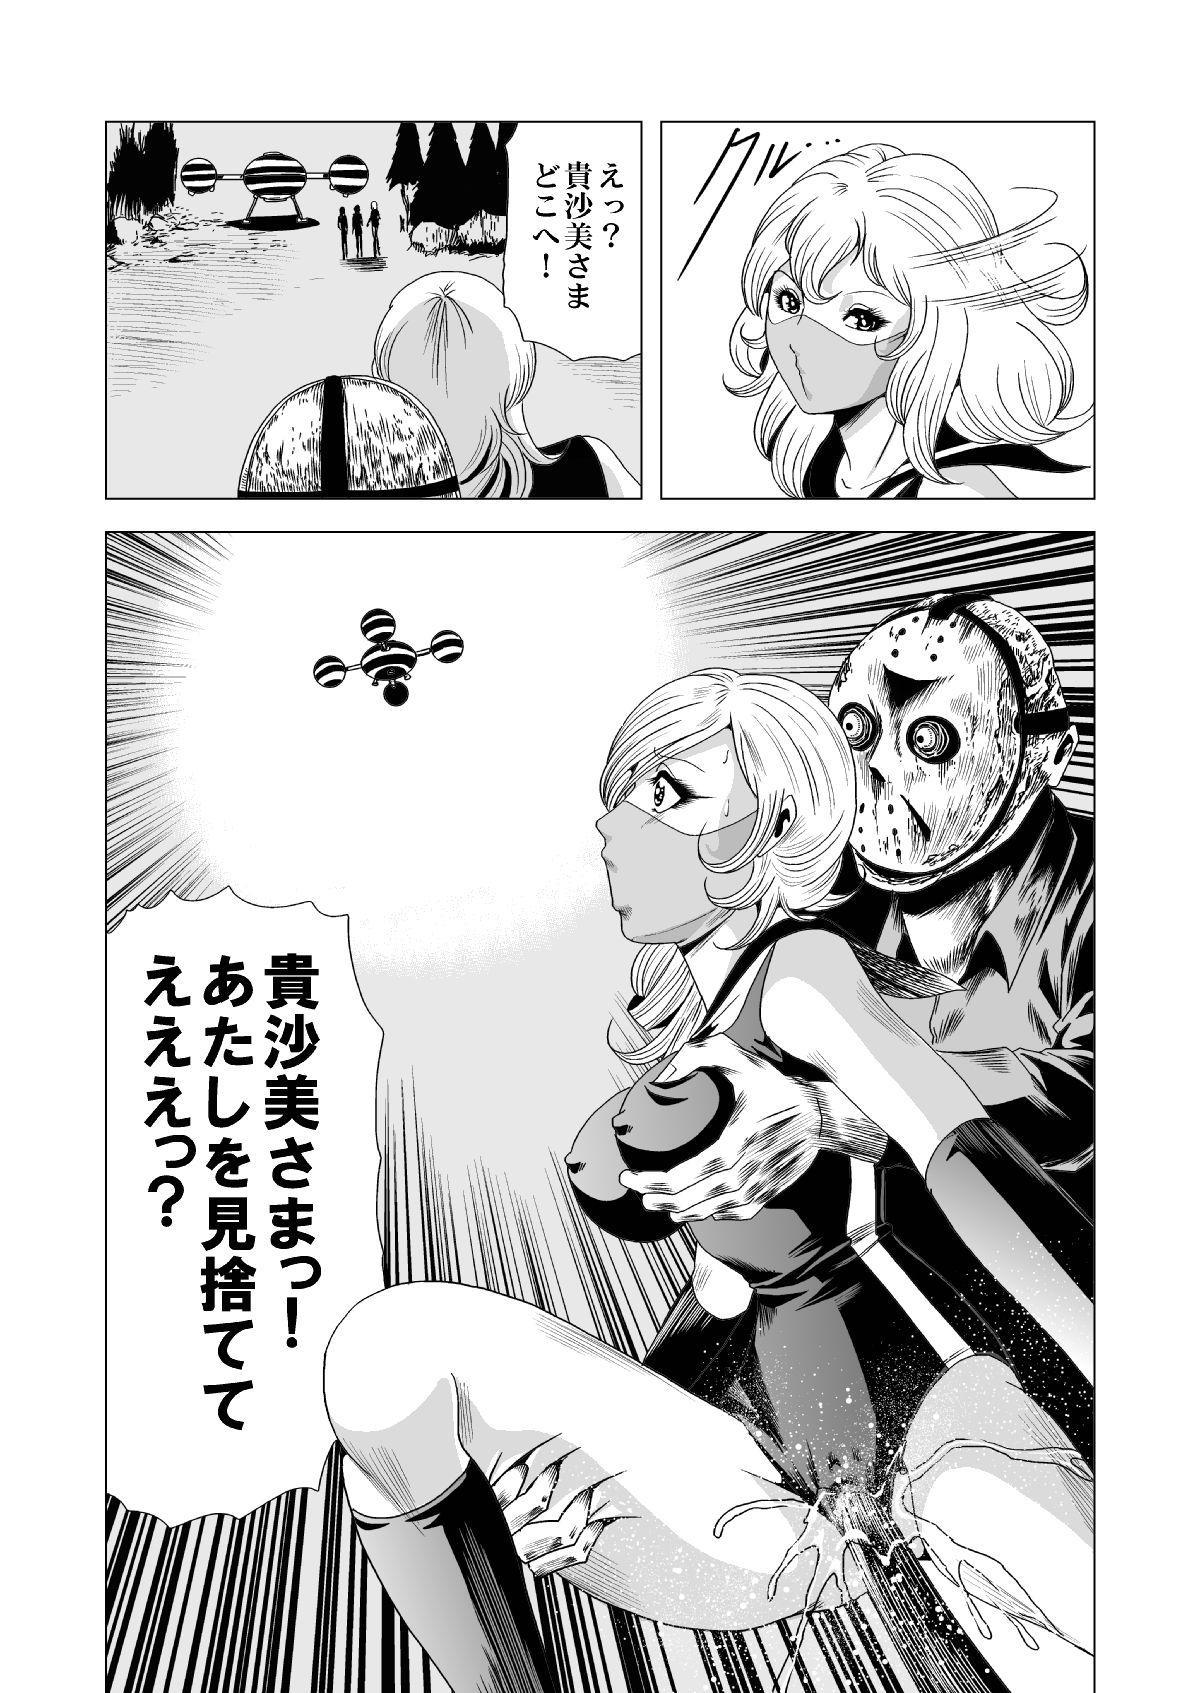 Sailor Onna Heishi Gundan Tai Ryouki Satsujinki 43